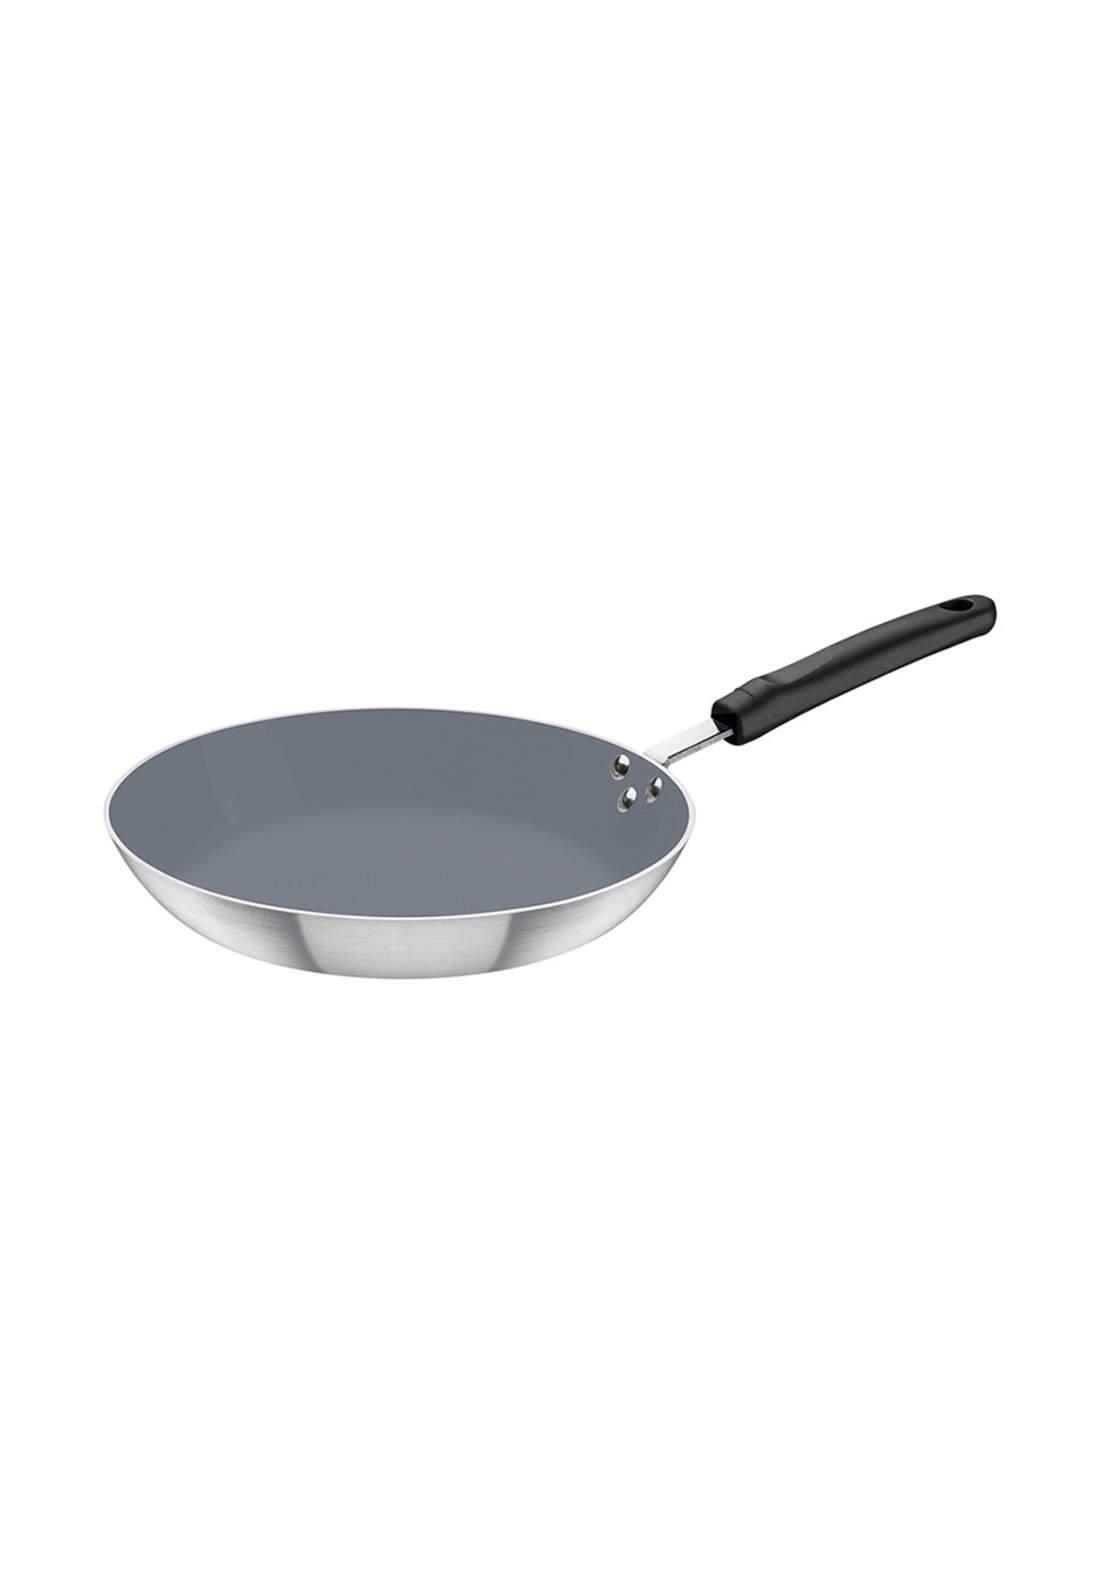 Tramontina '20884-028  Professional Frying Pan 28cm  مقلاة